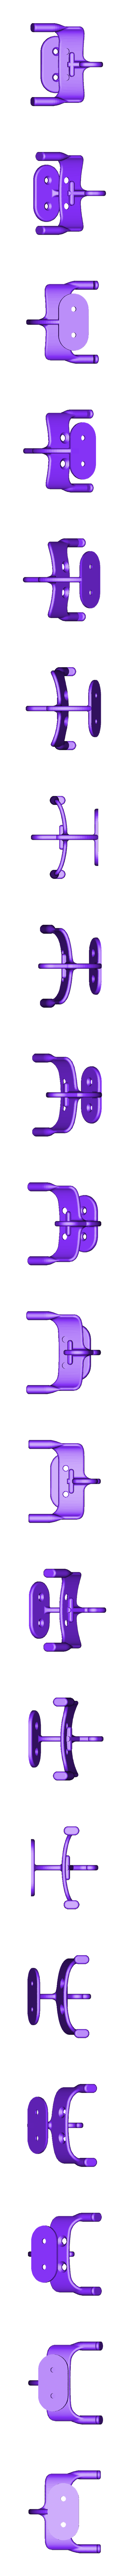 headphone holder.stl Download free STL file headphone holder • 3D print template, Cihan_Serbest